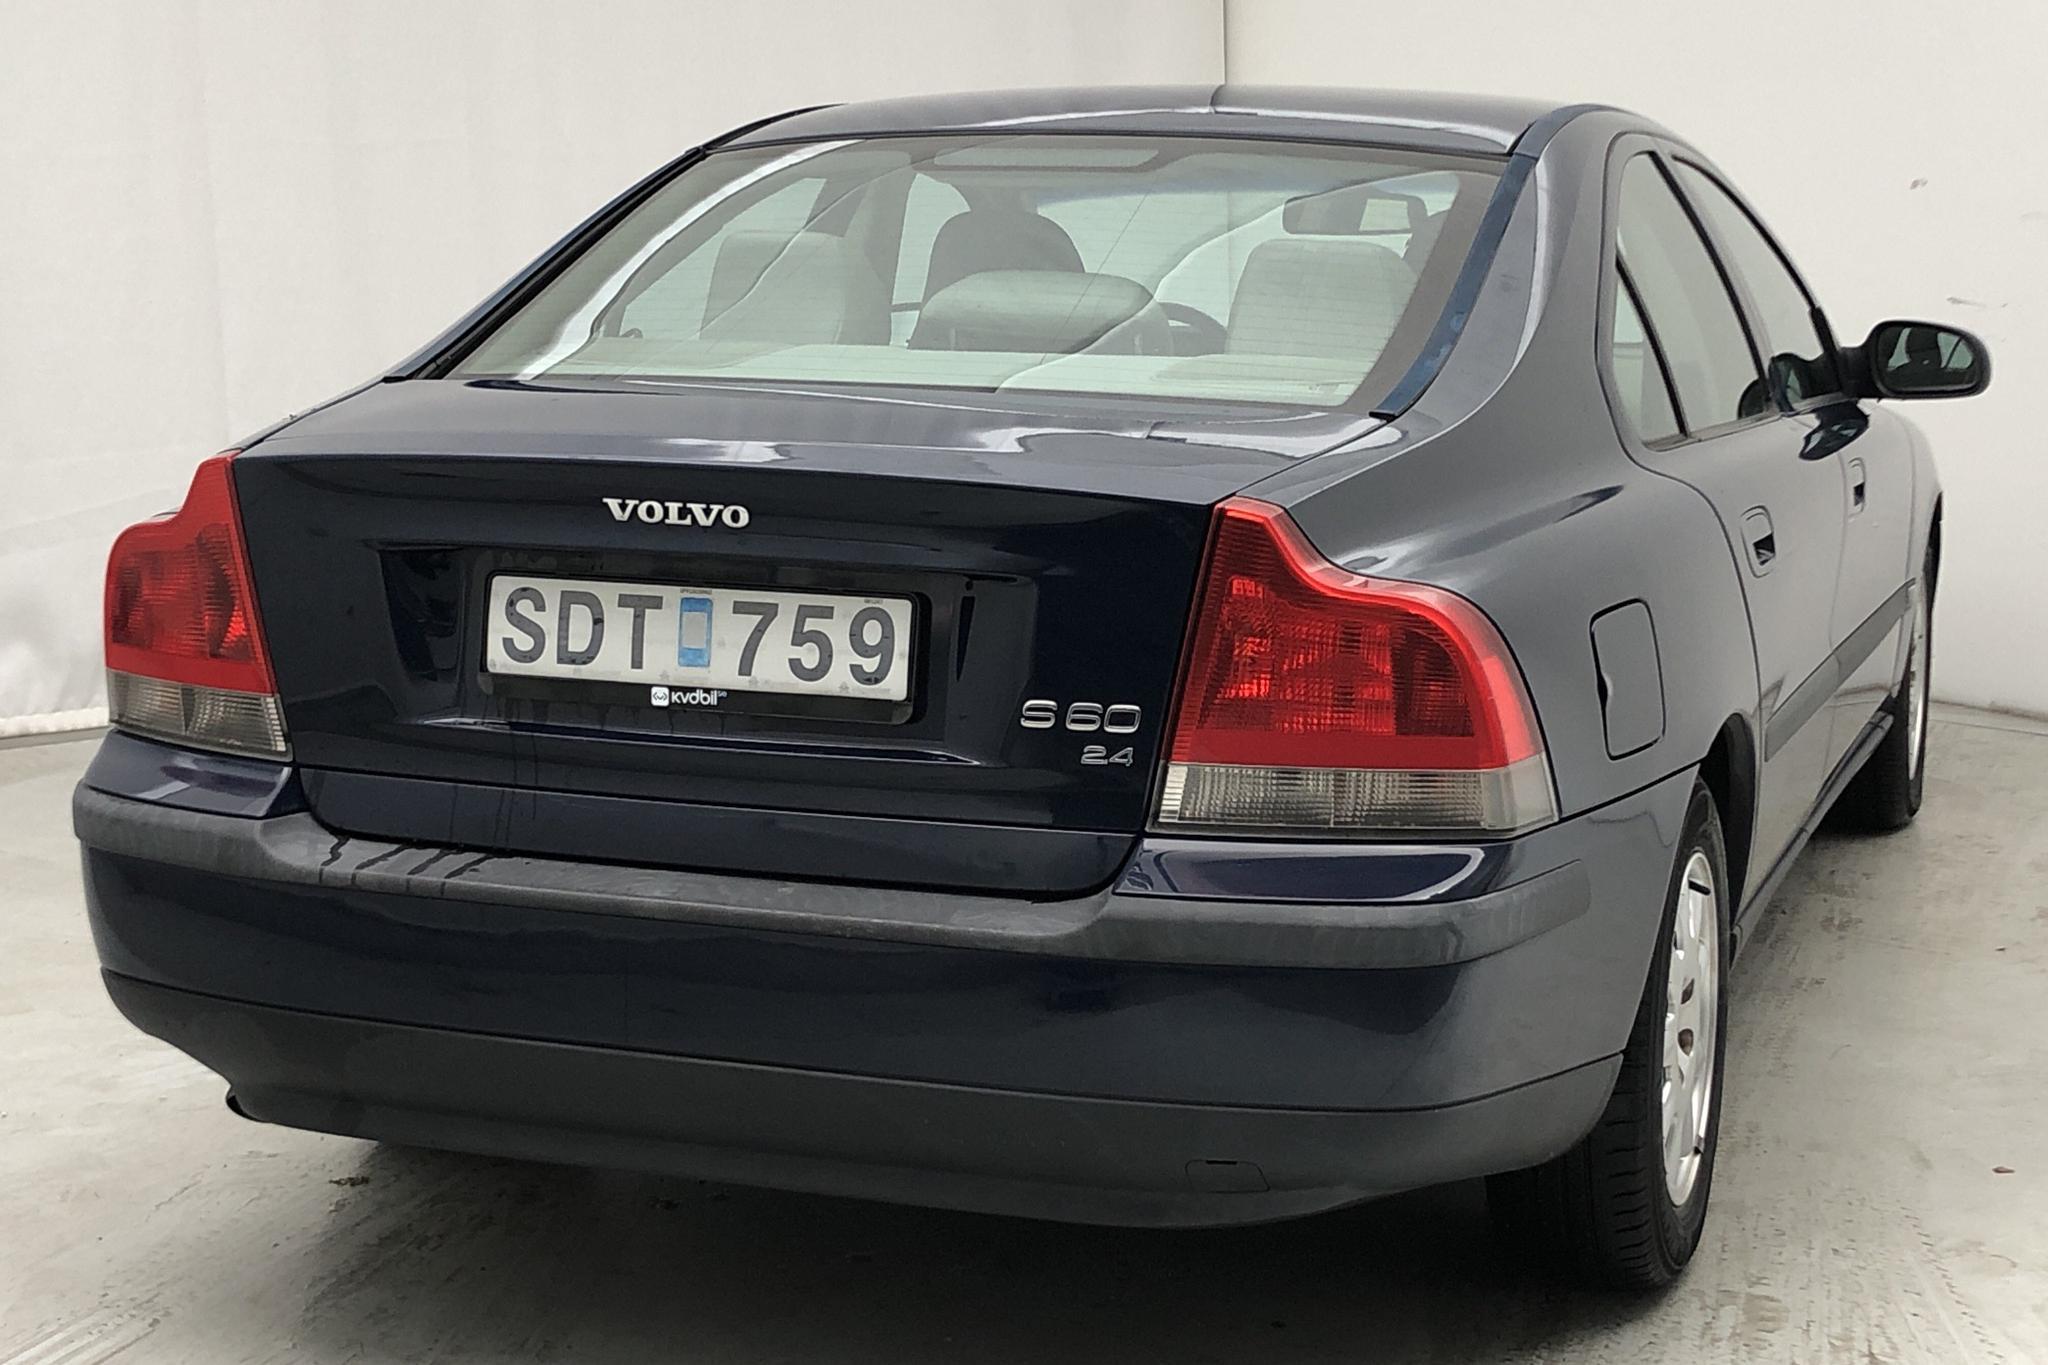 Volvo S60 2.4 (170hk) - 224 000 km - Automatic - Dark Blue - 2001